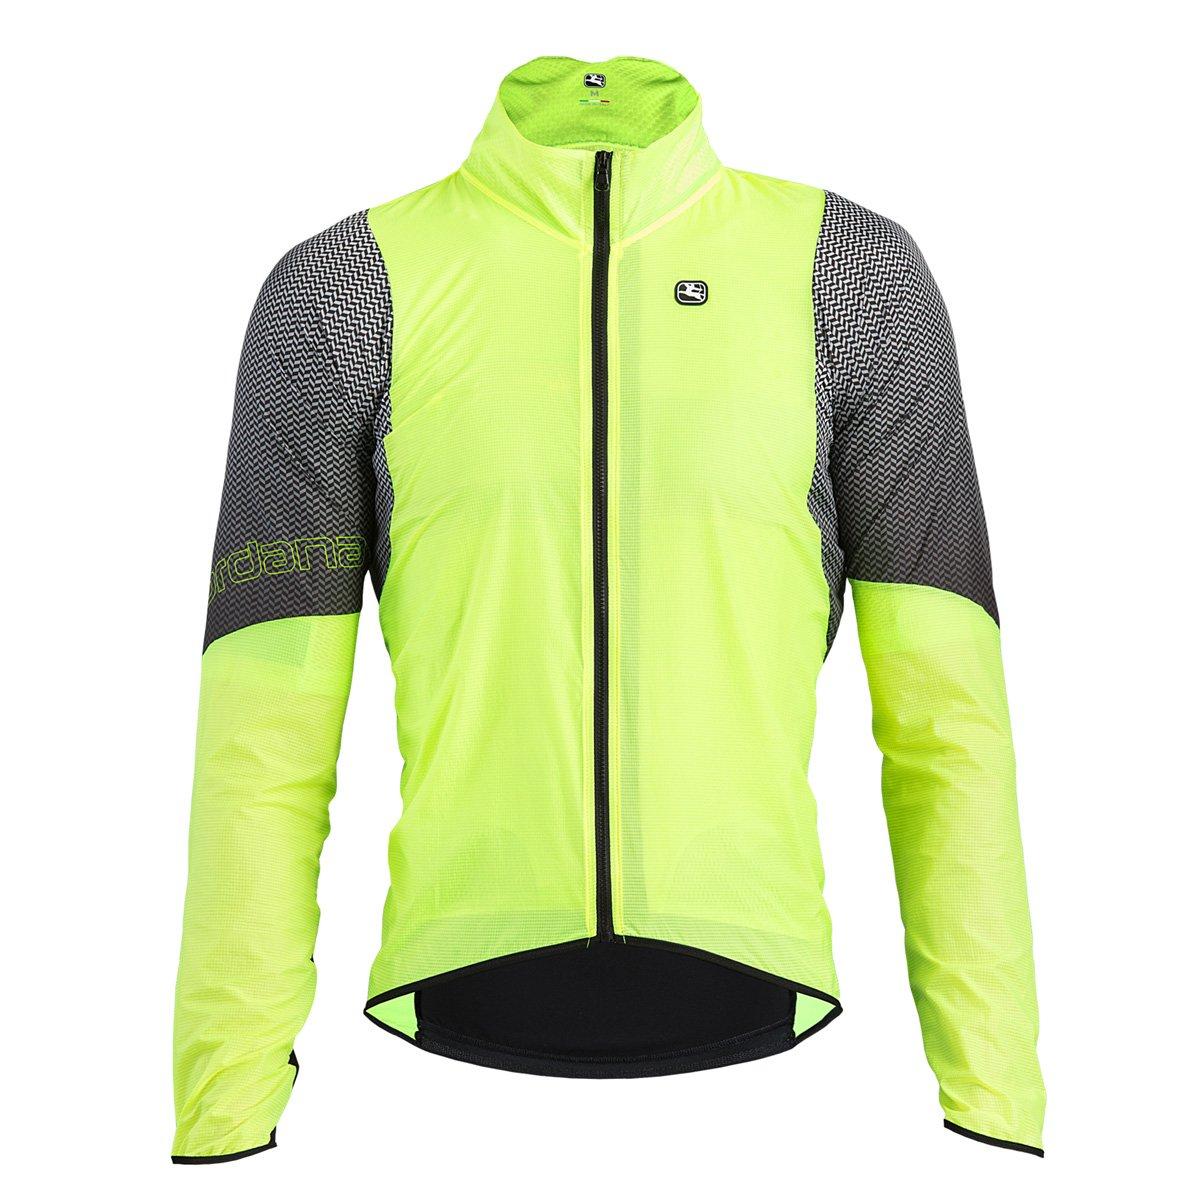 Giordana 2018メンズnx-g風サイクリングジャケット – gics18-jckt-nxgl B07BKP92QB X-Large Fluo/Black Fluo/Black X-Large